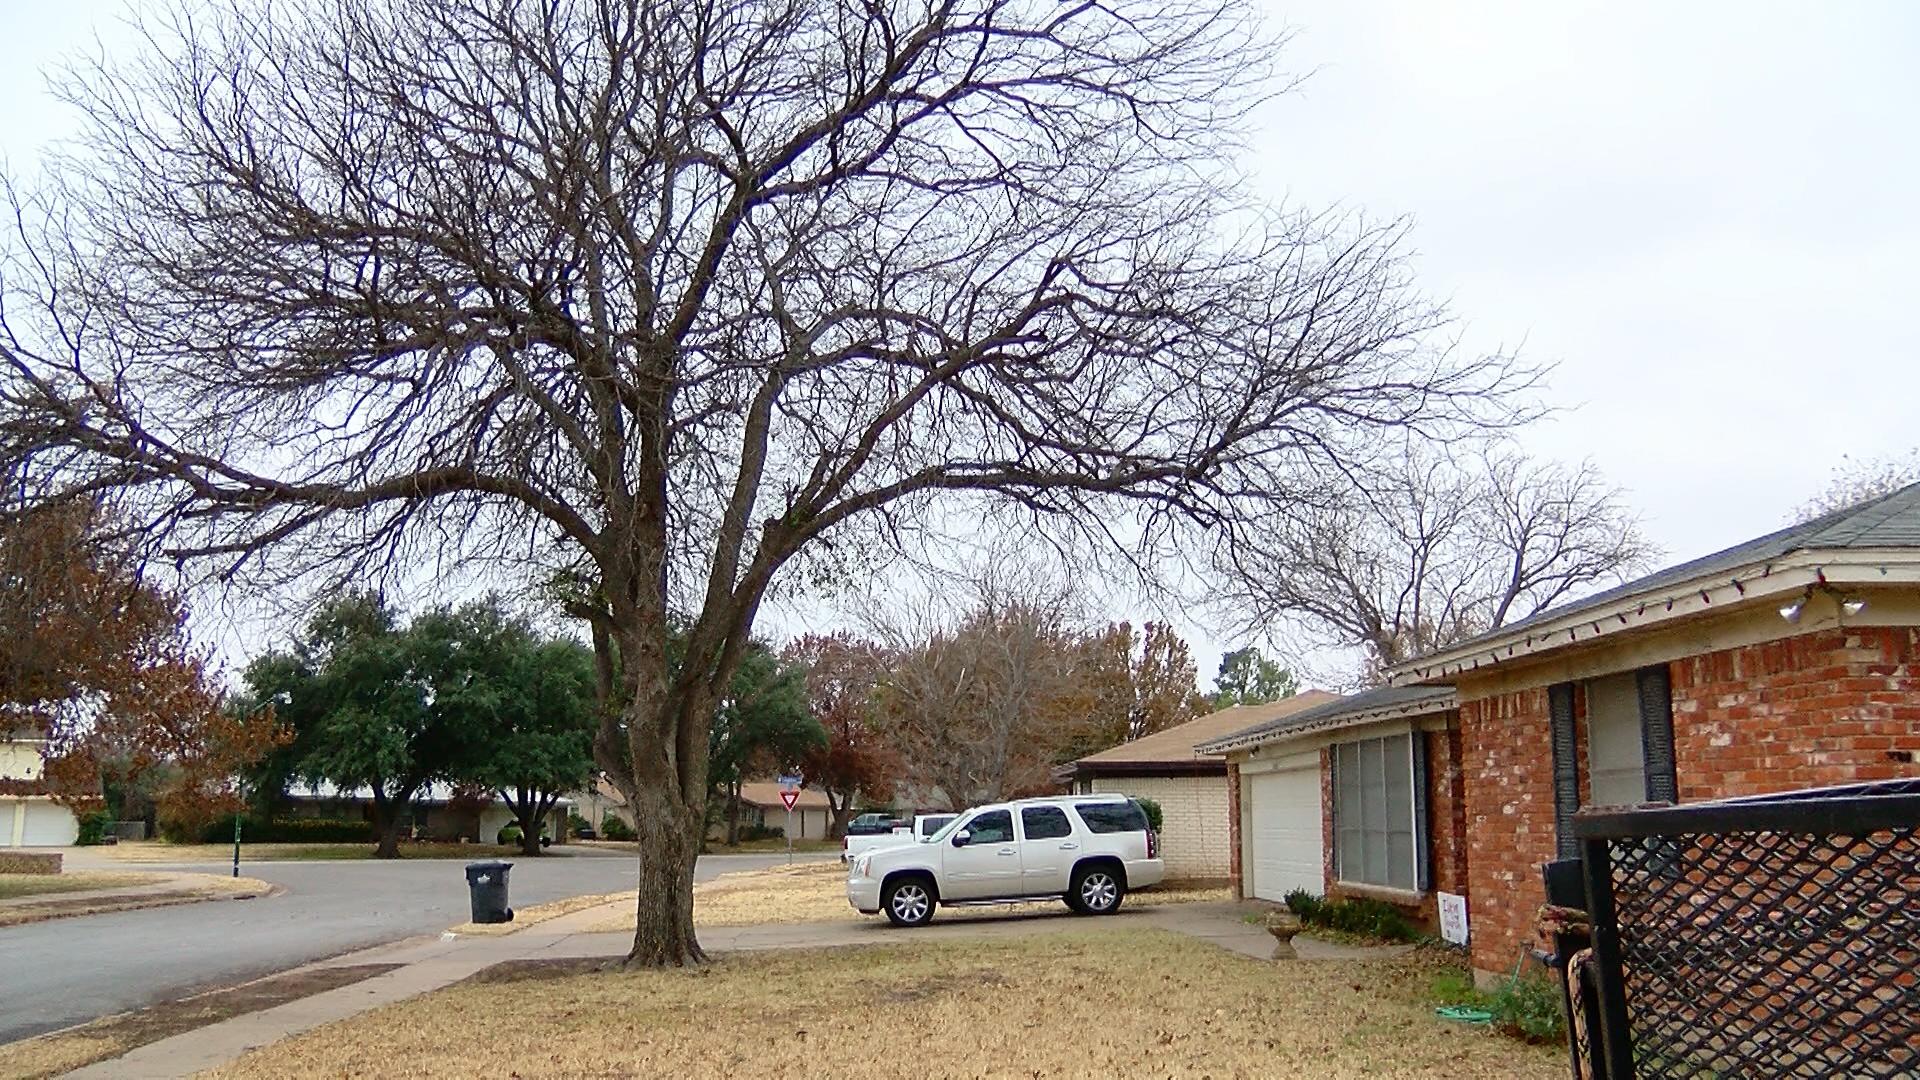 TREE DAMAGE_1544743693399.jpg.jpg